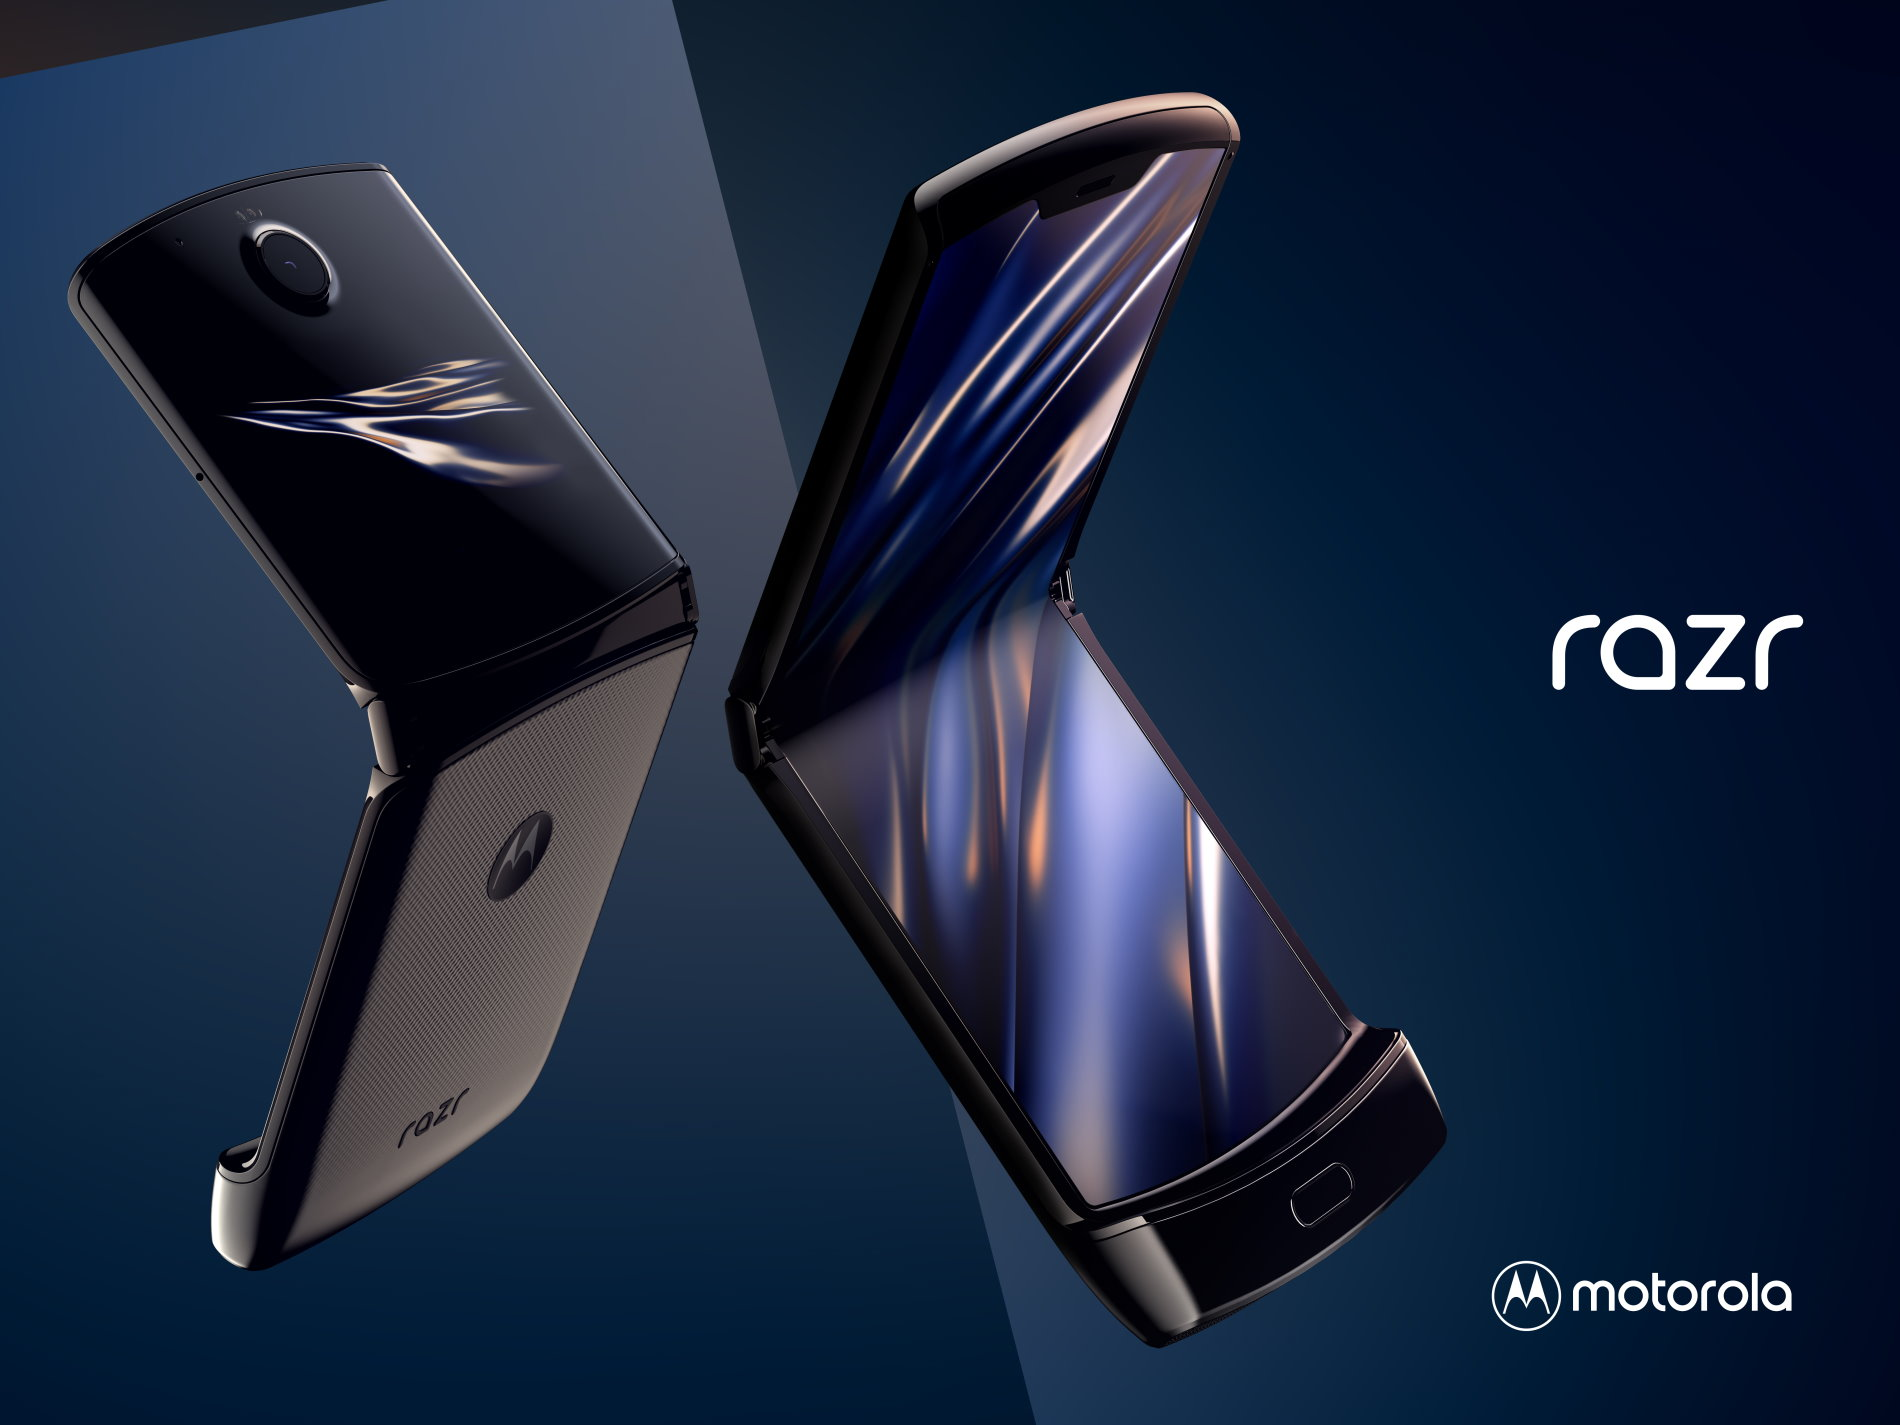 L'emblématique Motorola Razr renaît avec un écran pliable